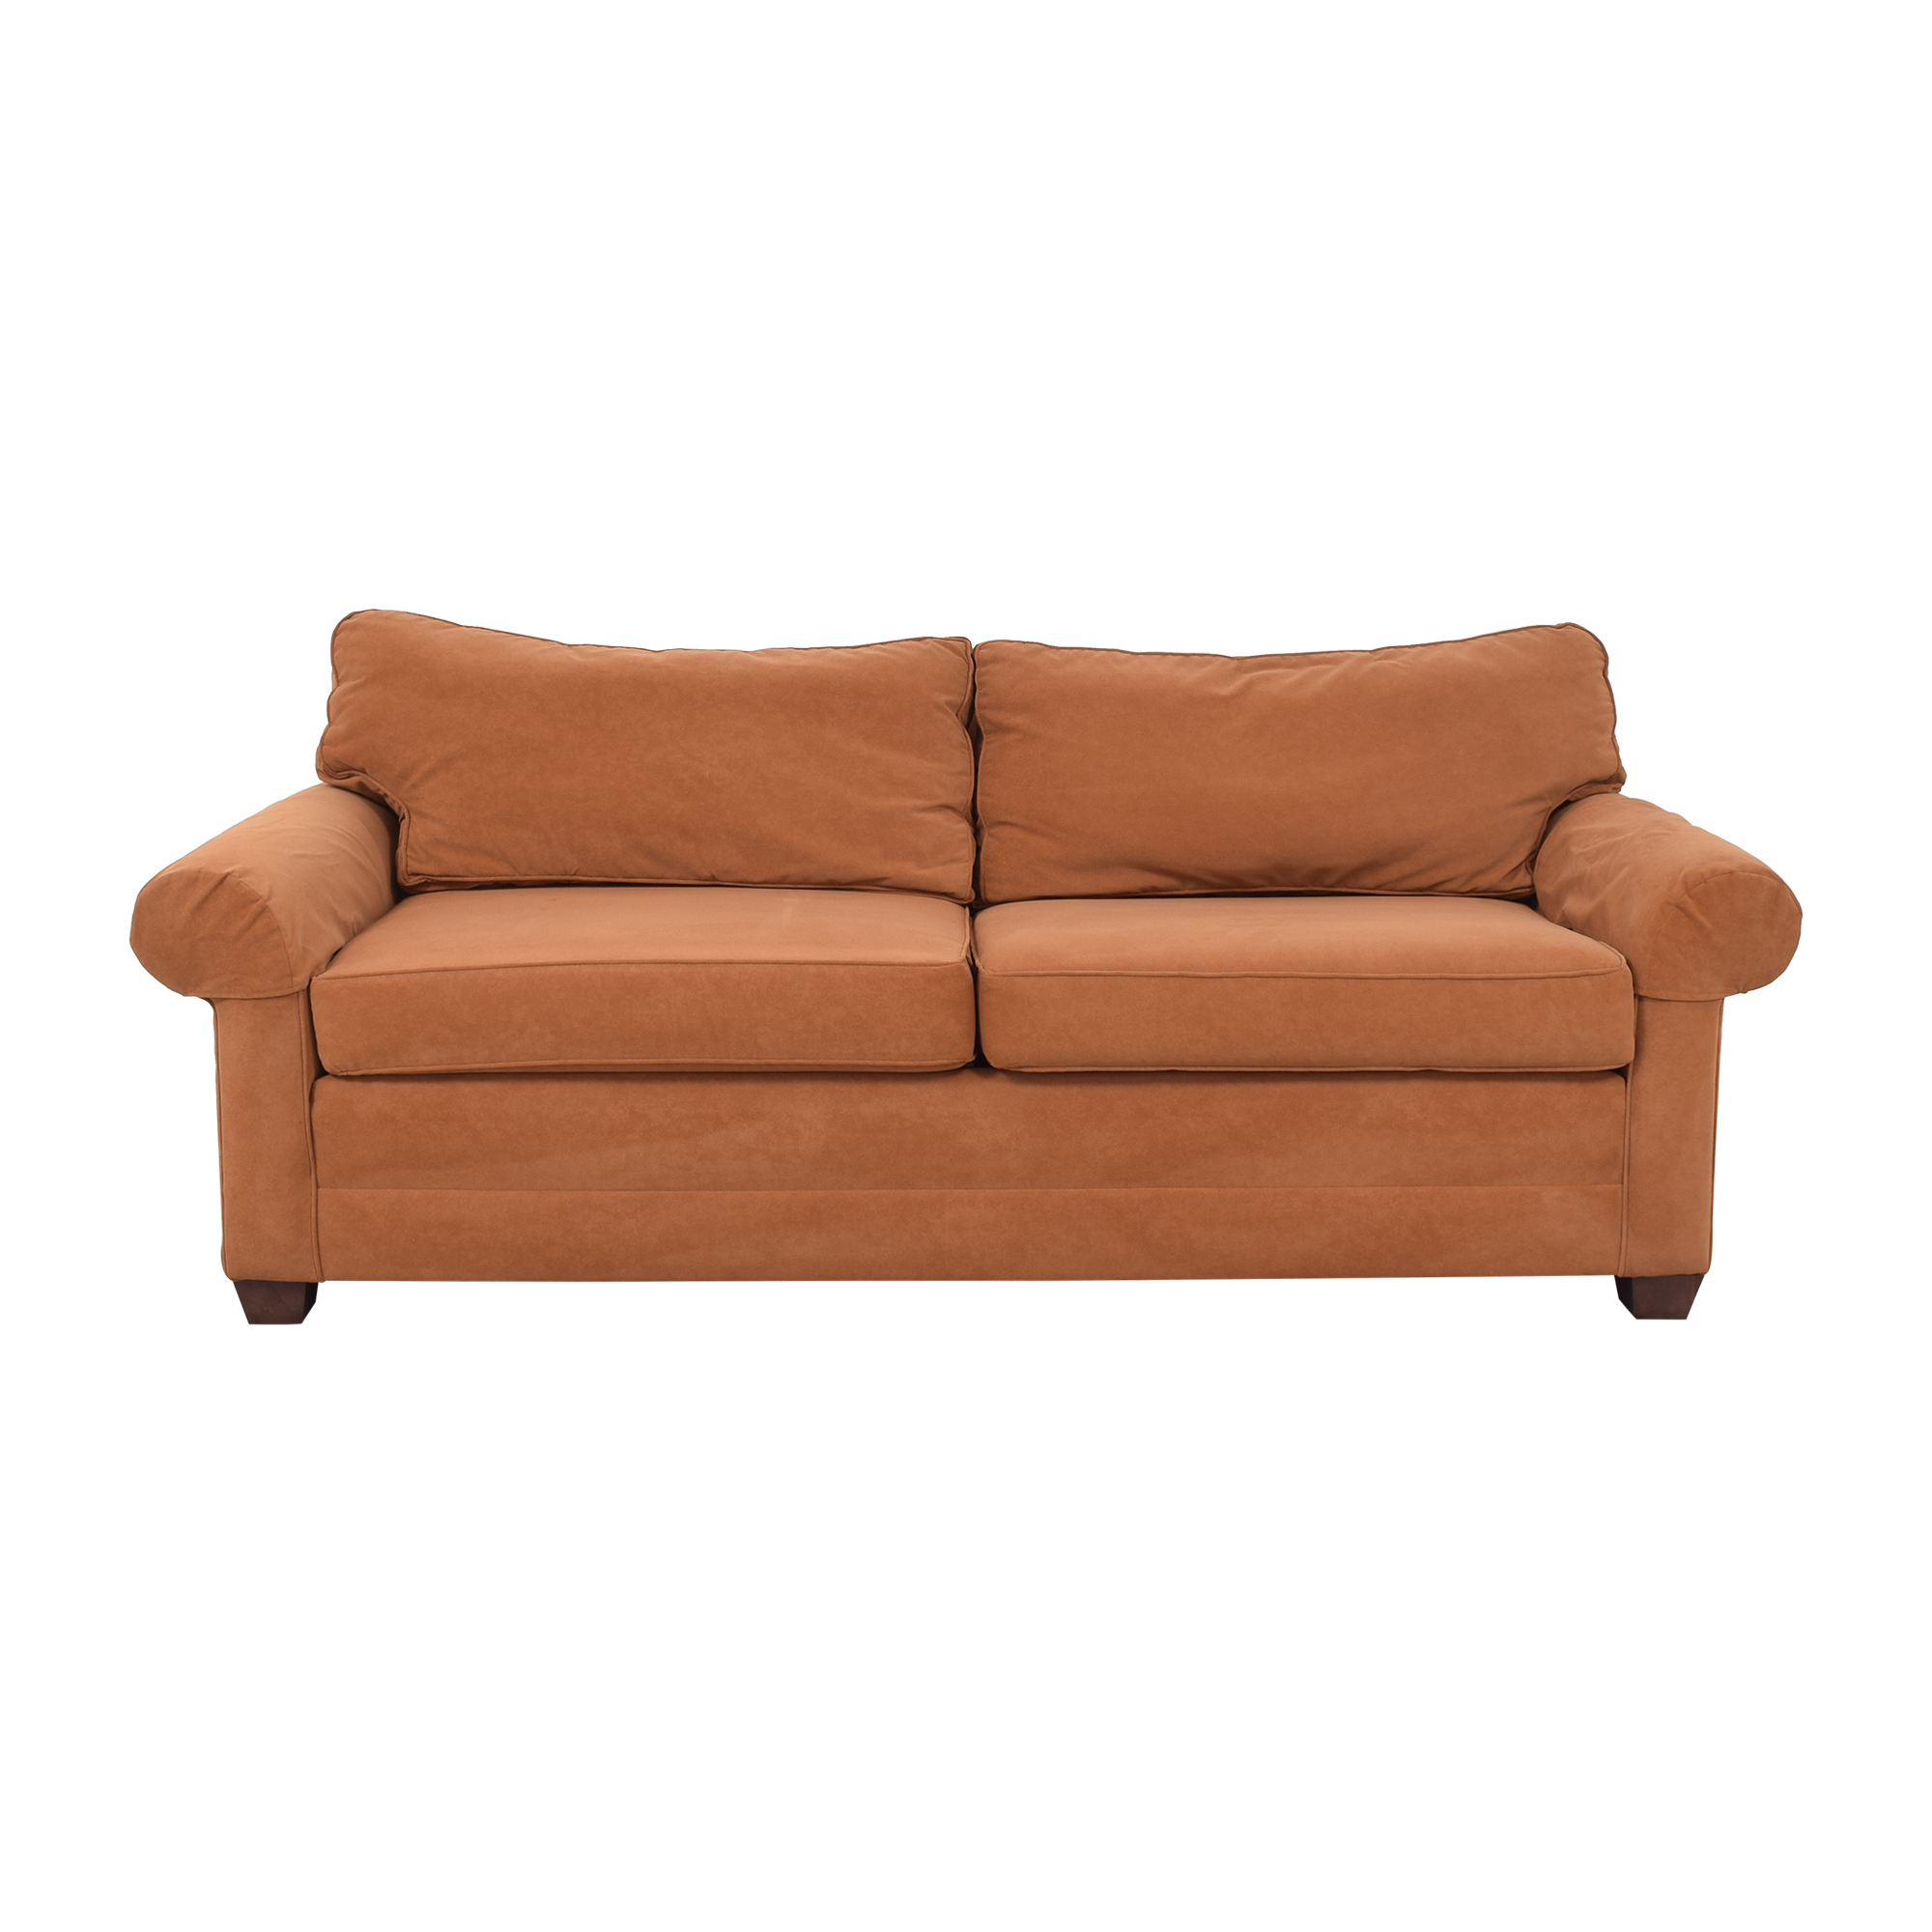 Ethan Allen Bennett Roll-Arm Sofa / Sofas